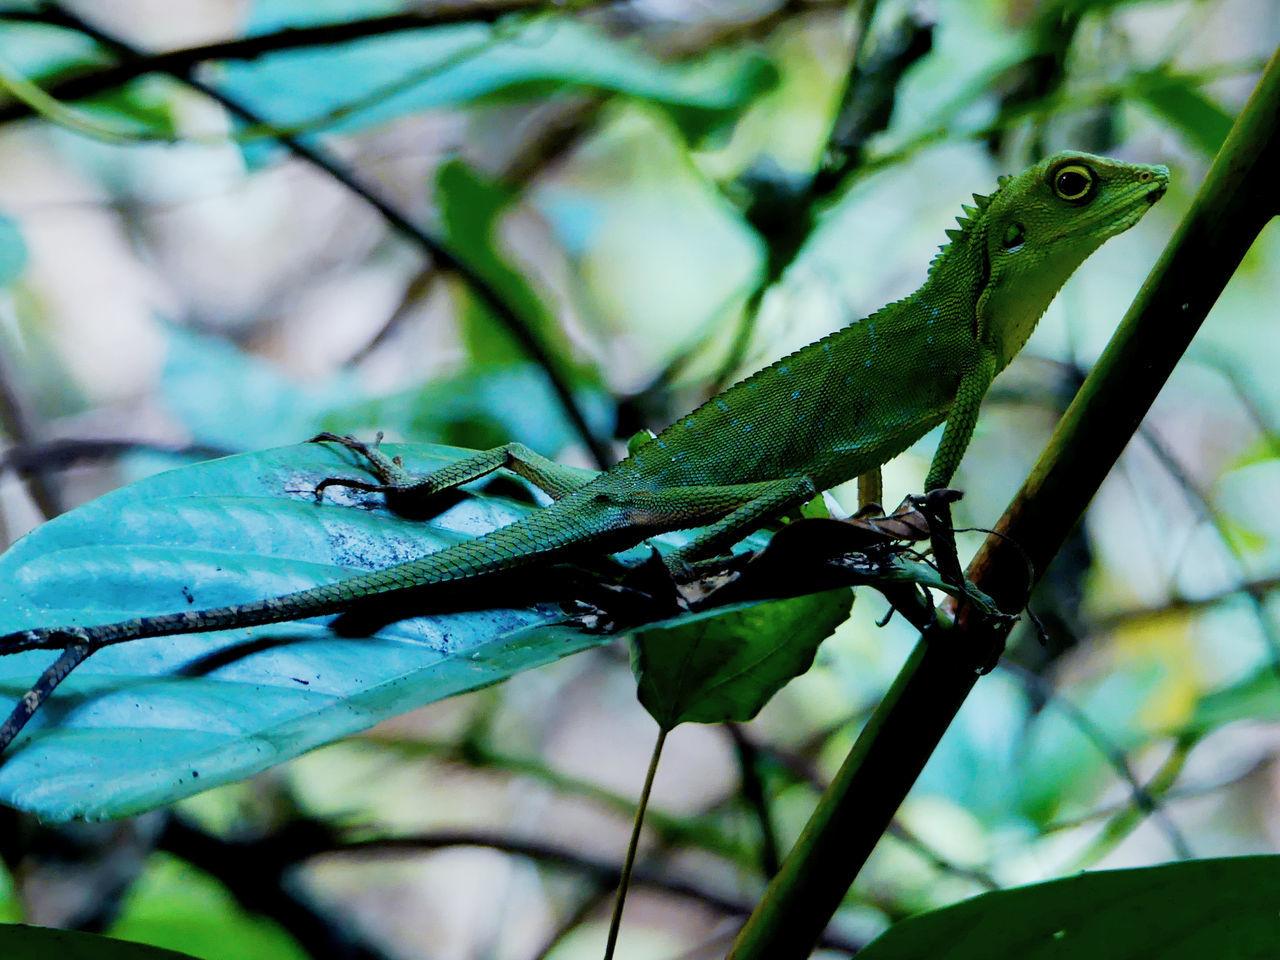 Lizard Animal Wildlife Borneo Lizard Lizard Nature Lizards Reptile Reptile Photography Reptile World Reptiles Tropical Paradise